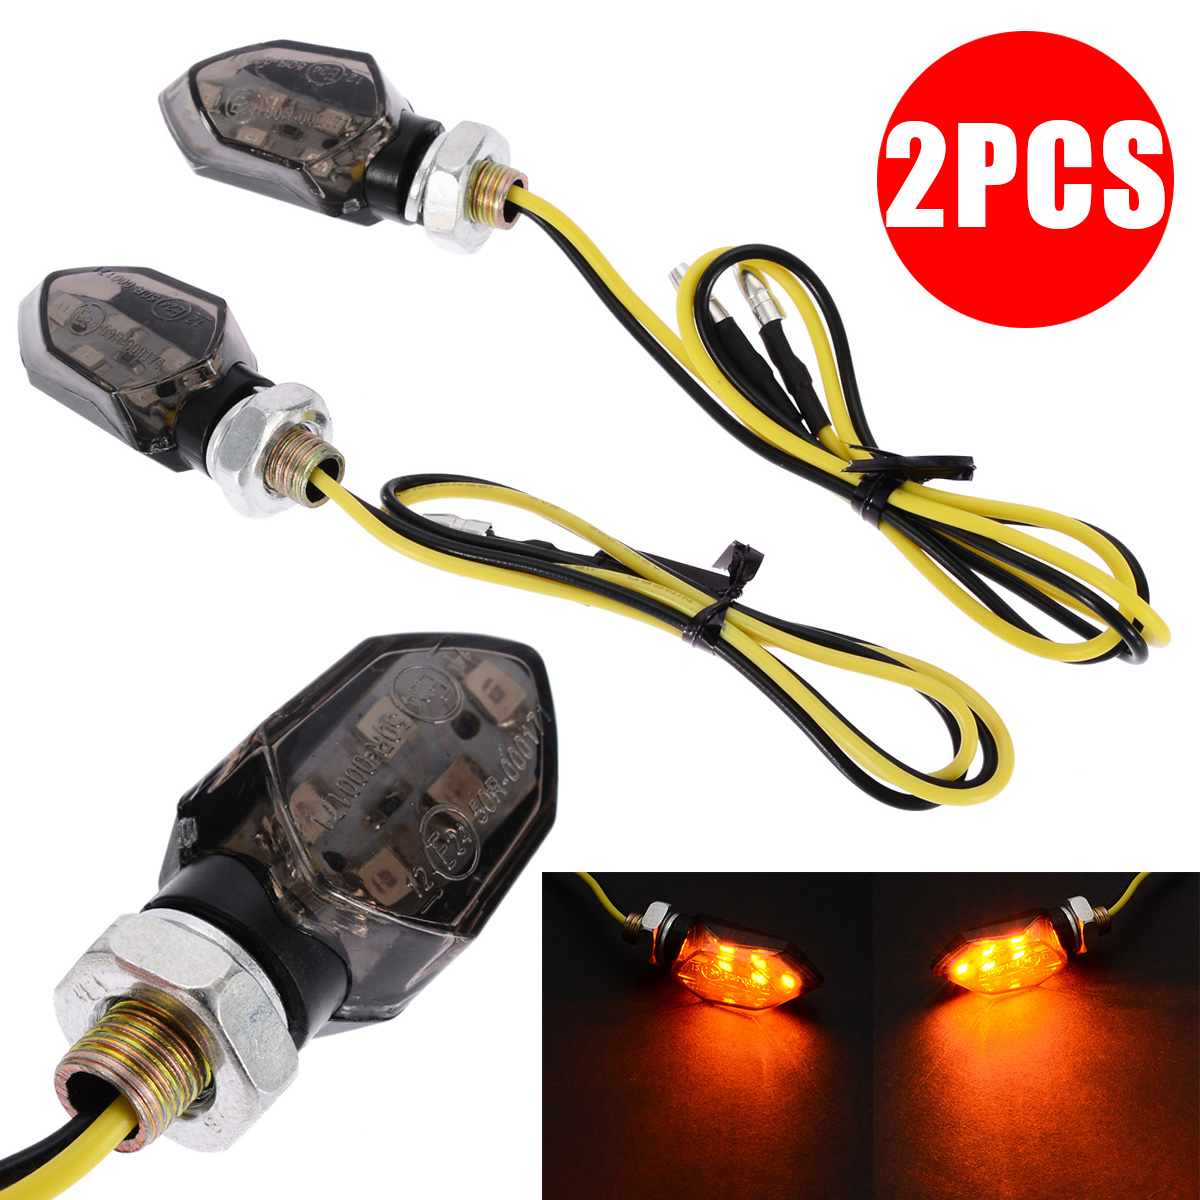 Treyues 2pcs Mini Universal Motorcycle LED Turn Signal Indicators Light Amber Blinker Led Motorbike Super Bright Lamp